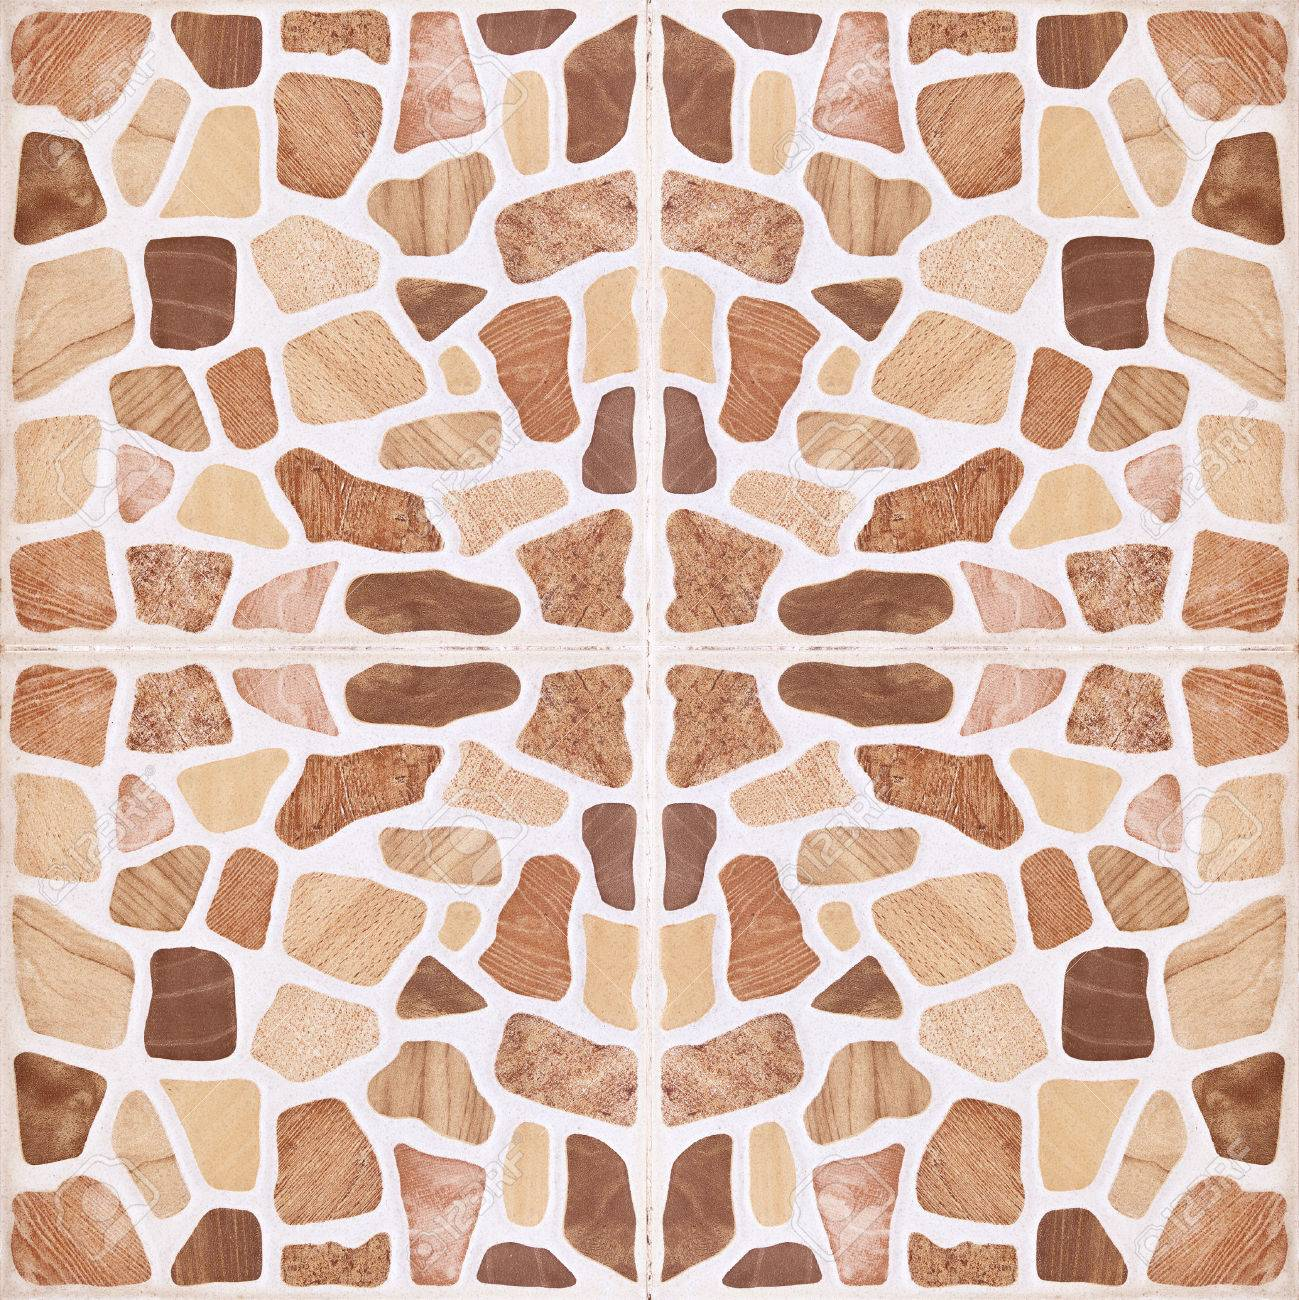 Ceramic tiles beige mosaic ceramic tiles for kitchen or bathroom ceramic tiles beige mosaic ceramic tiles for kitchen or bathroom wall or floor stock dailygadgetfo Images